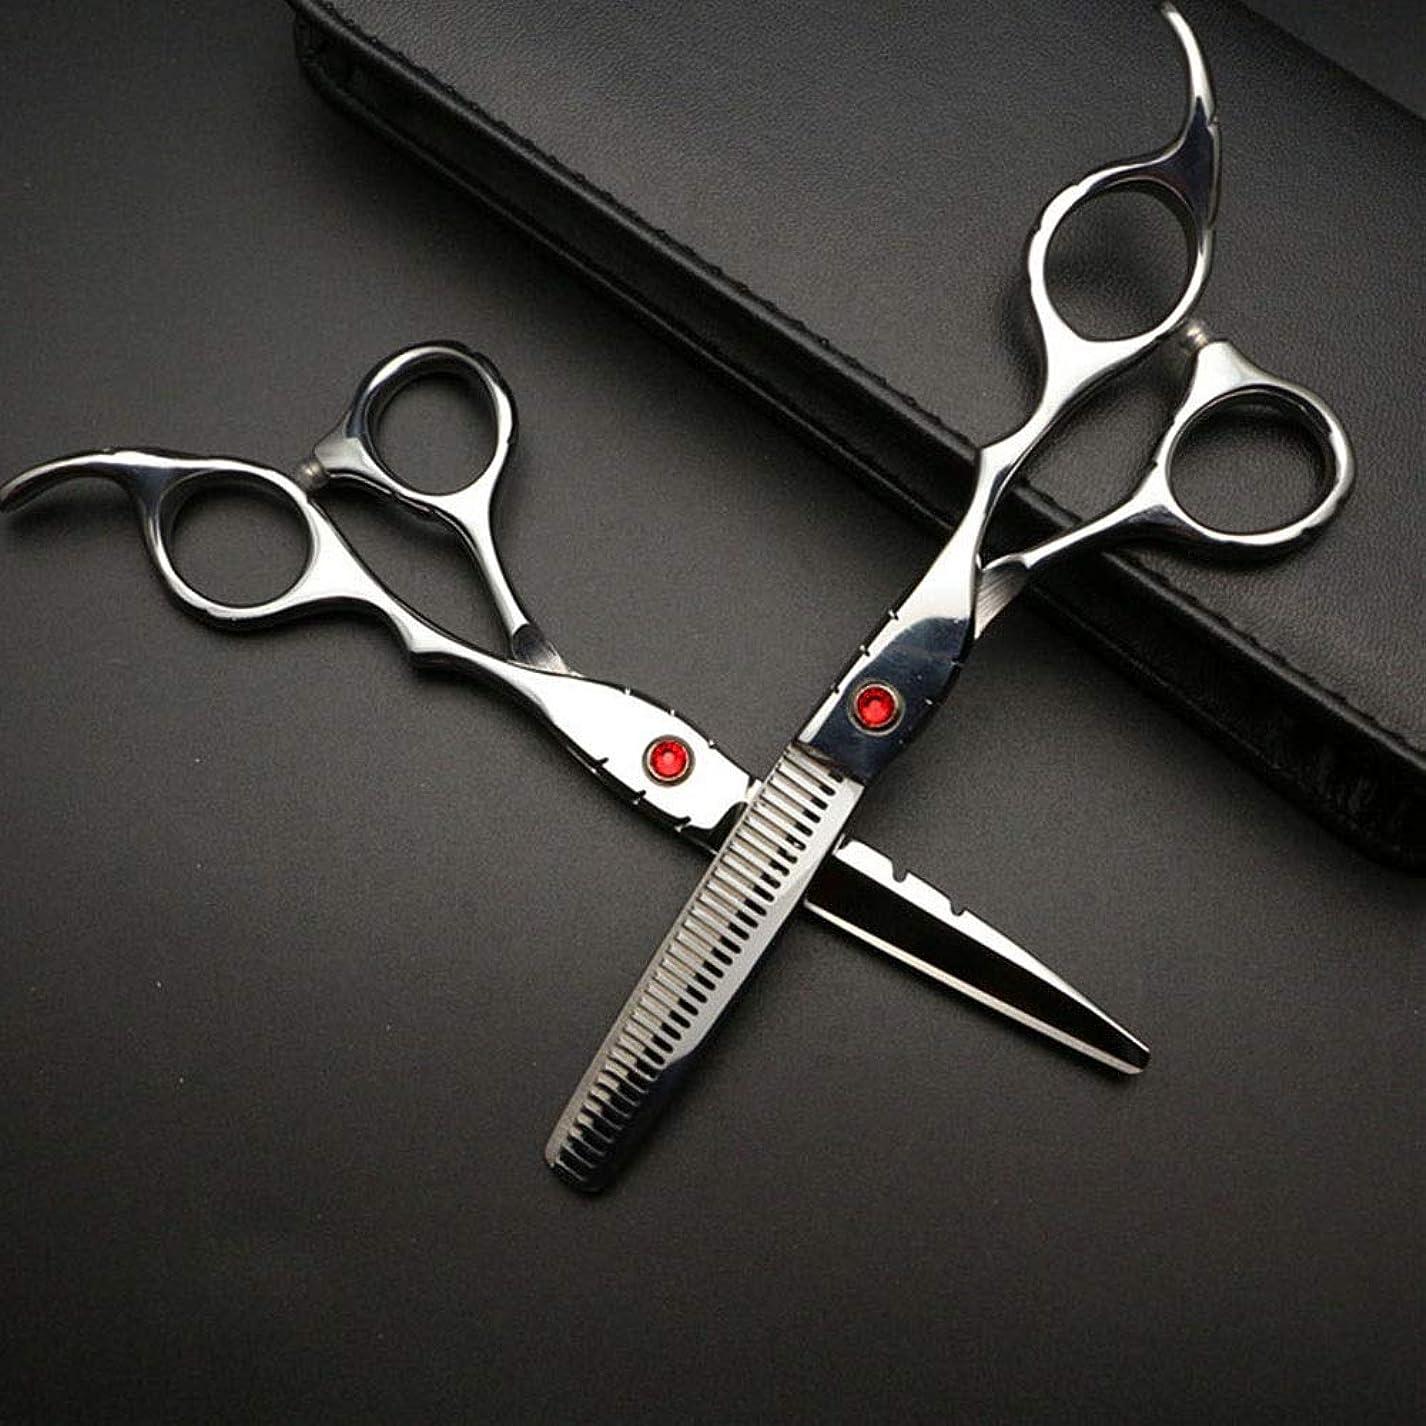 MengY 6インチ美容院プロフェッショナル理髪セット、ハイエンド理髪フラットシザーはさみ (色 : Silver)